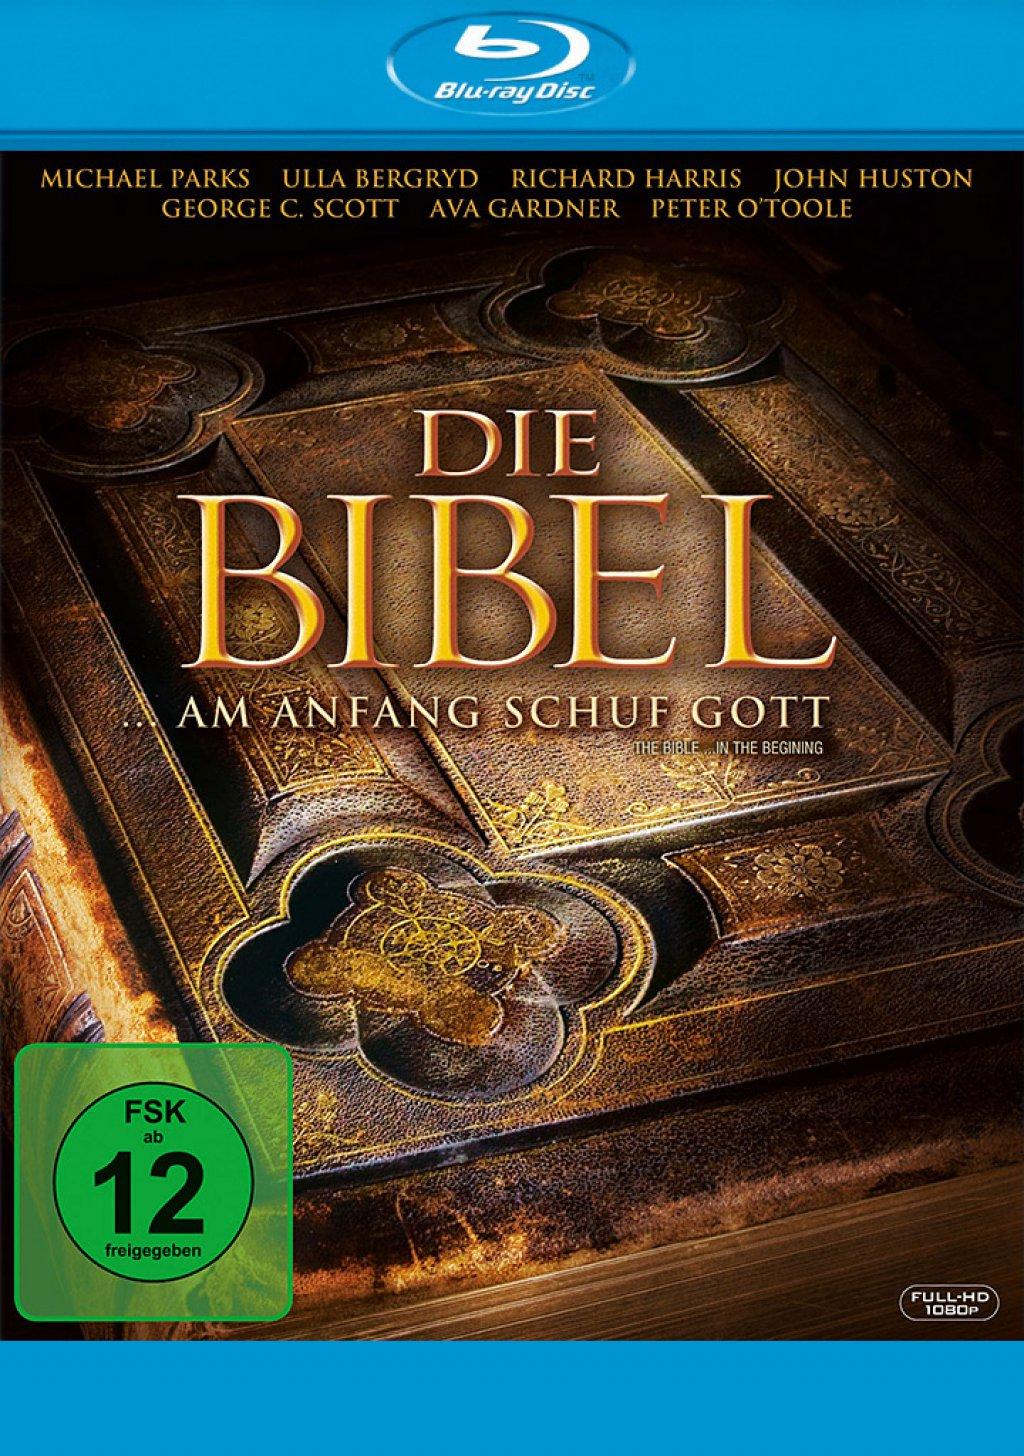 Die Bibel - ... Am Anfang schuf Gott (Blu-ray)